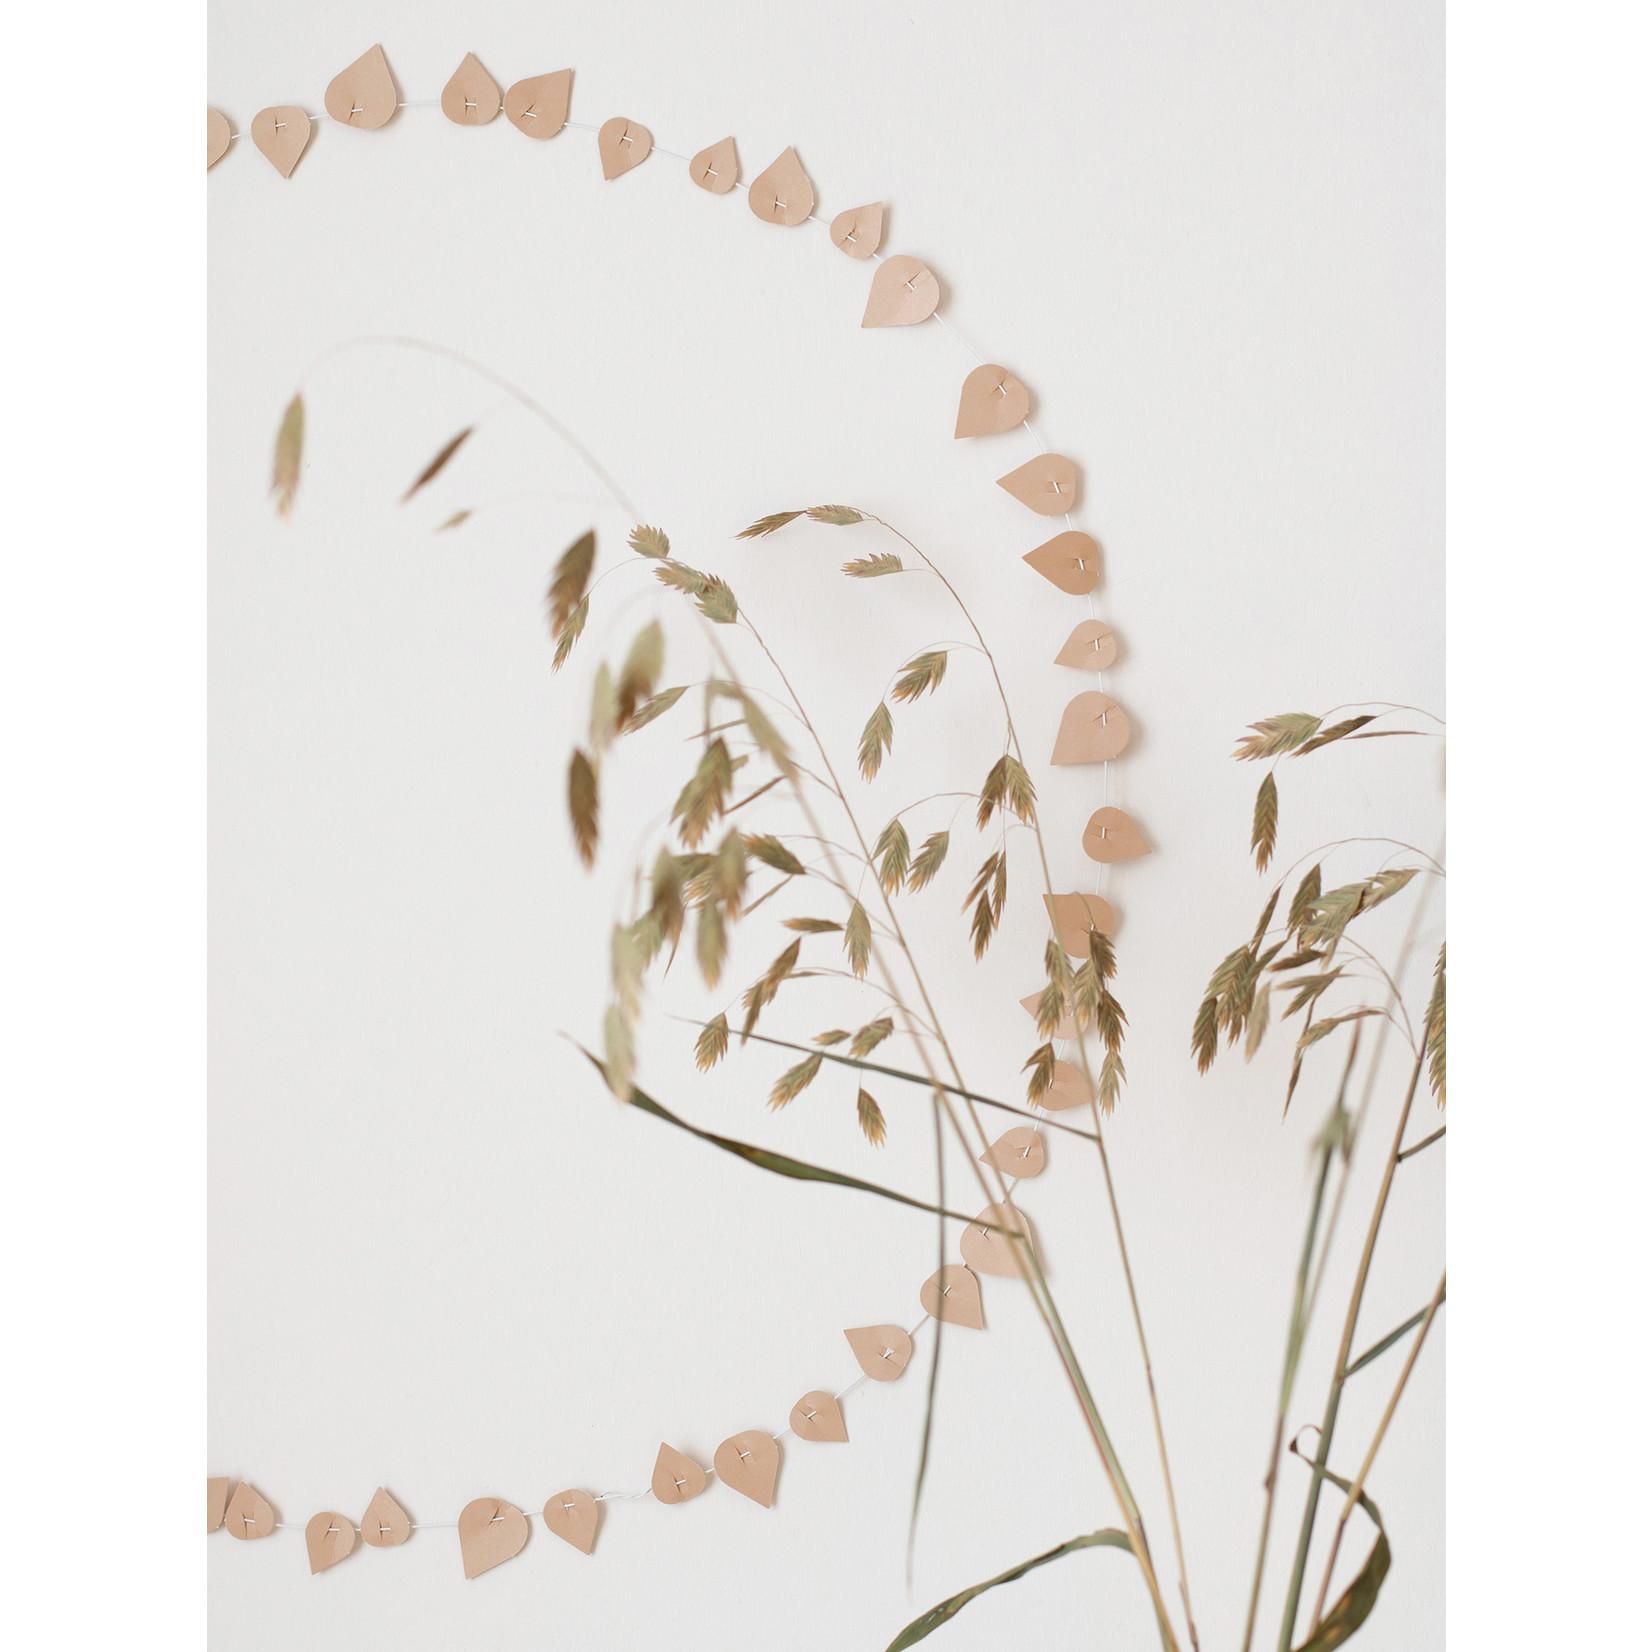 Jurianne Matter Twig leaves Blushing beige